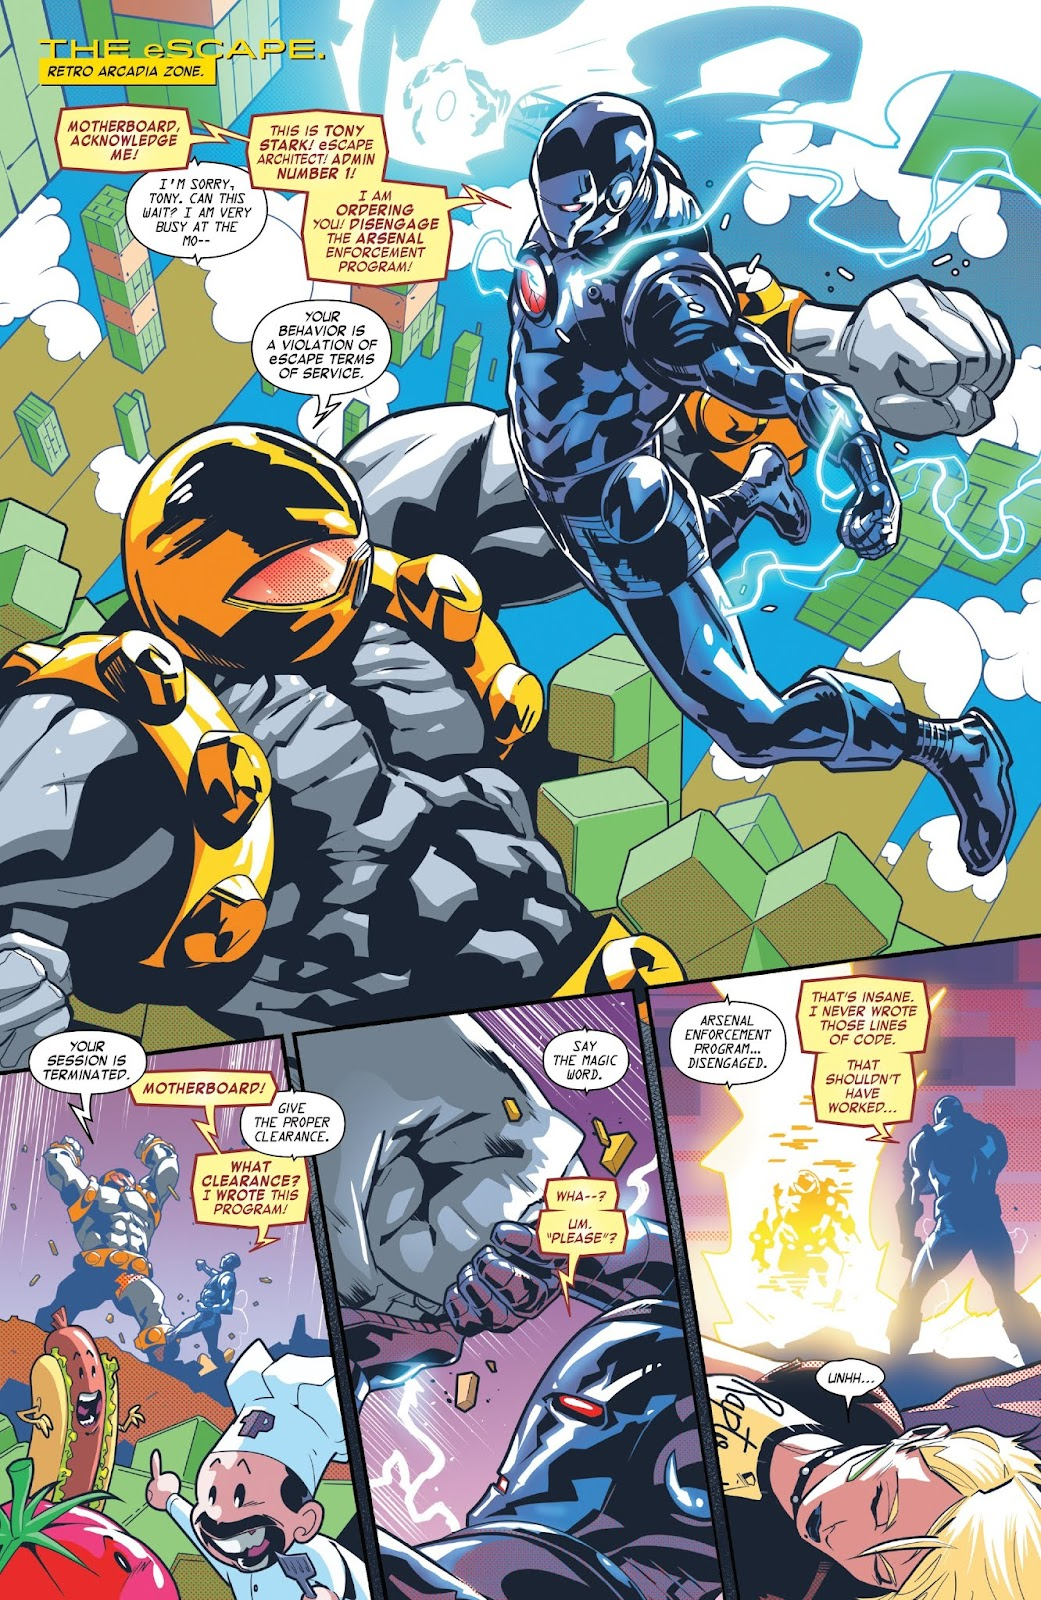 Read online Tony Stark: Iron Man comic -  Issue #7 - 5